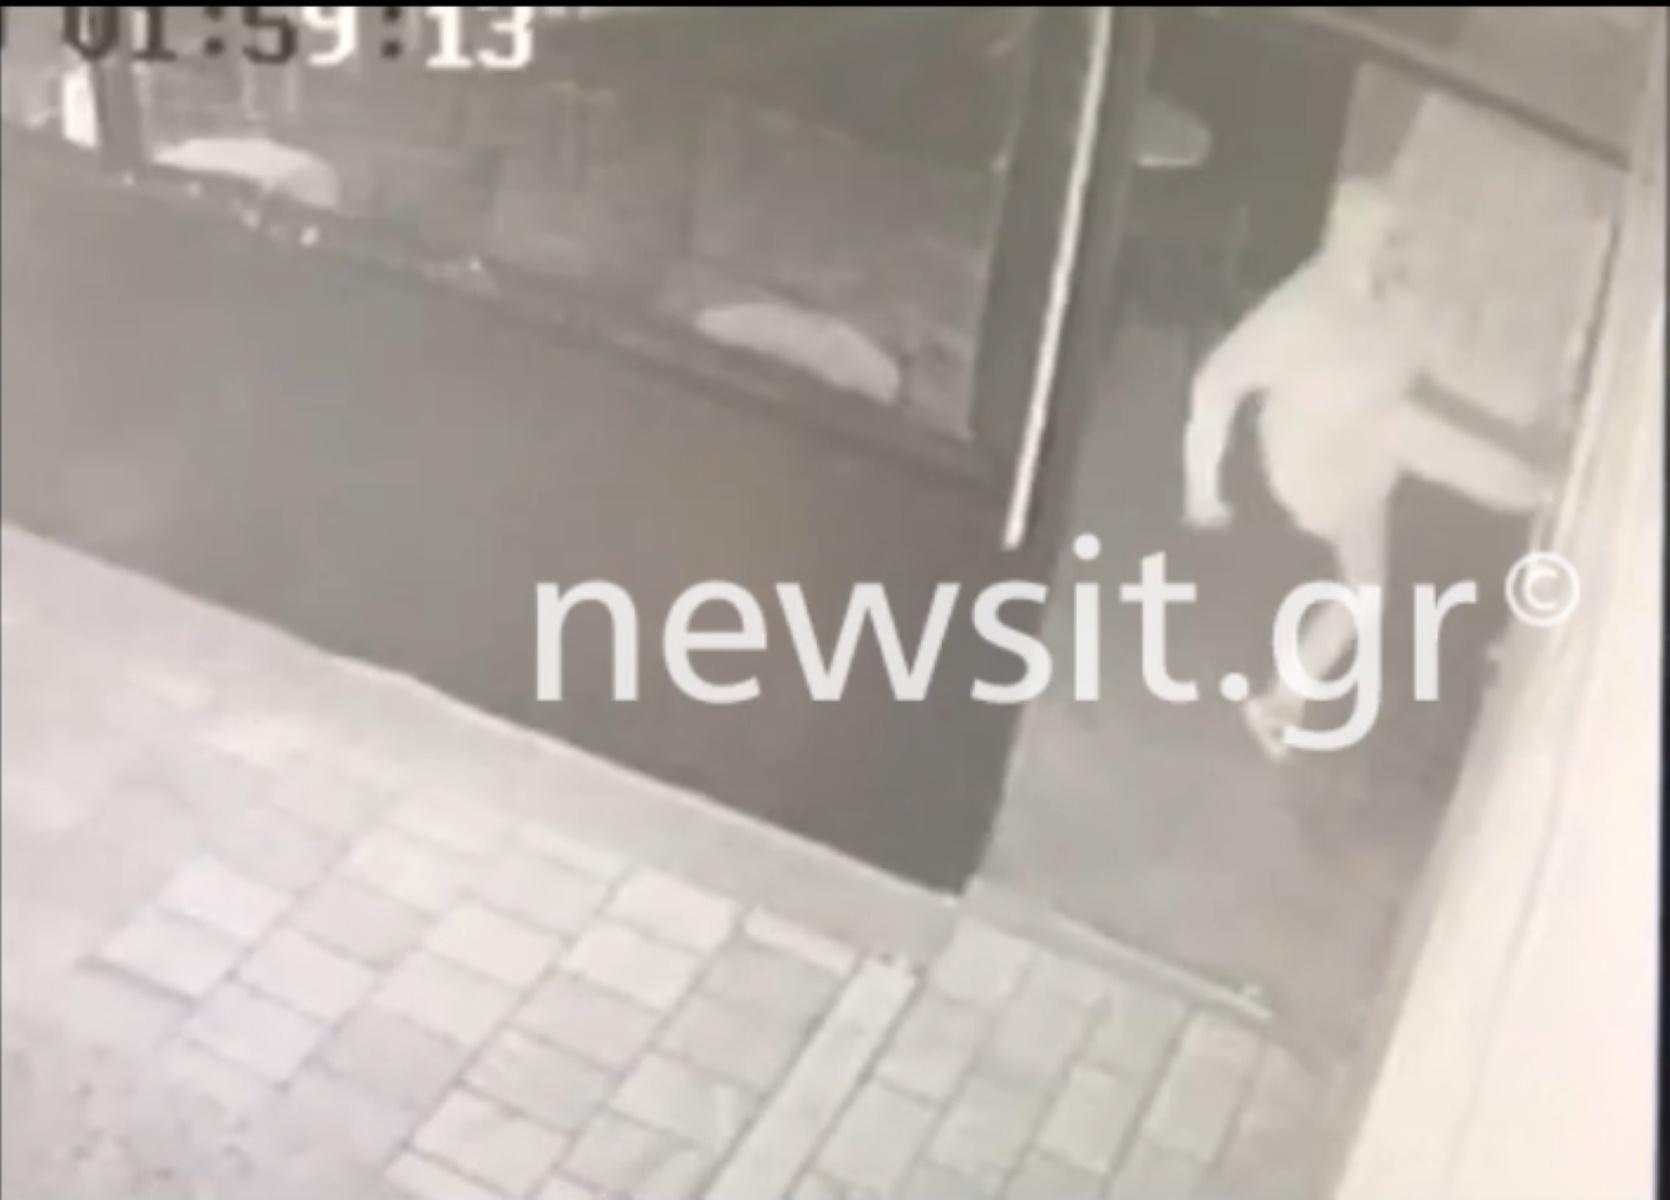 Video ντοκουμέντο: Διαρρήκτης «καρατέκα» μπούκαρε σε καταστήματα σπάζοντας τις τζαμαρίες με κλωτσιές